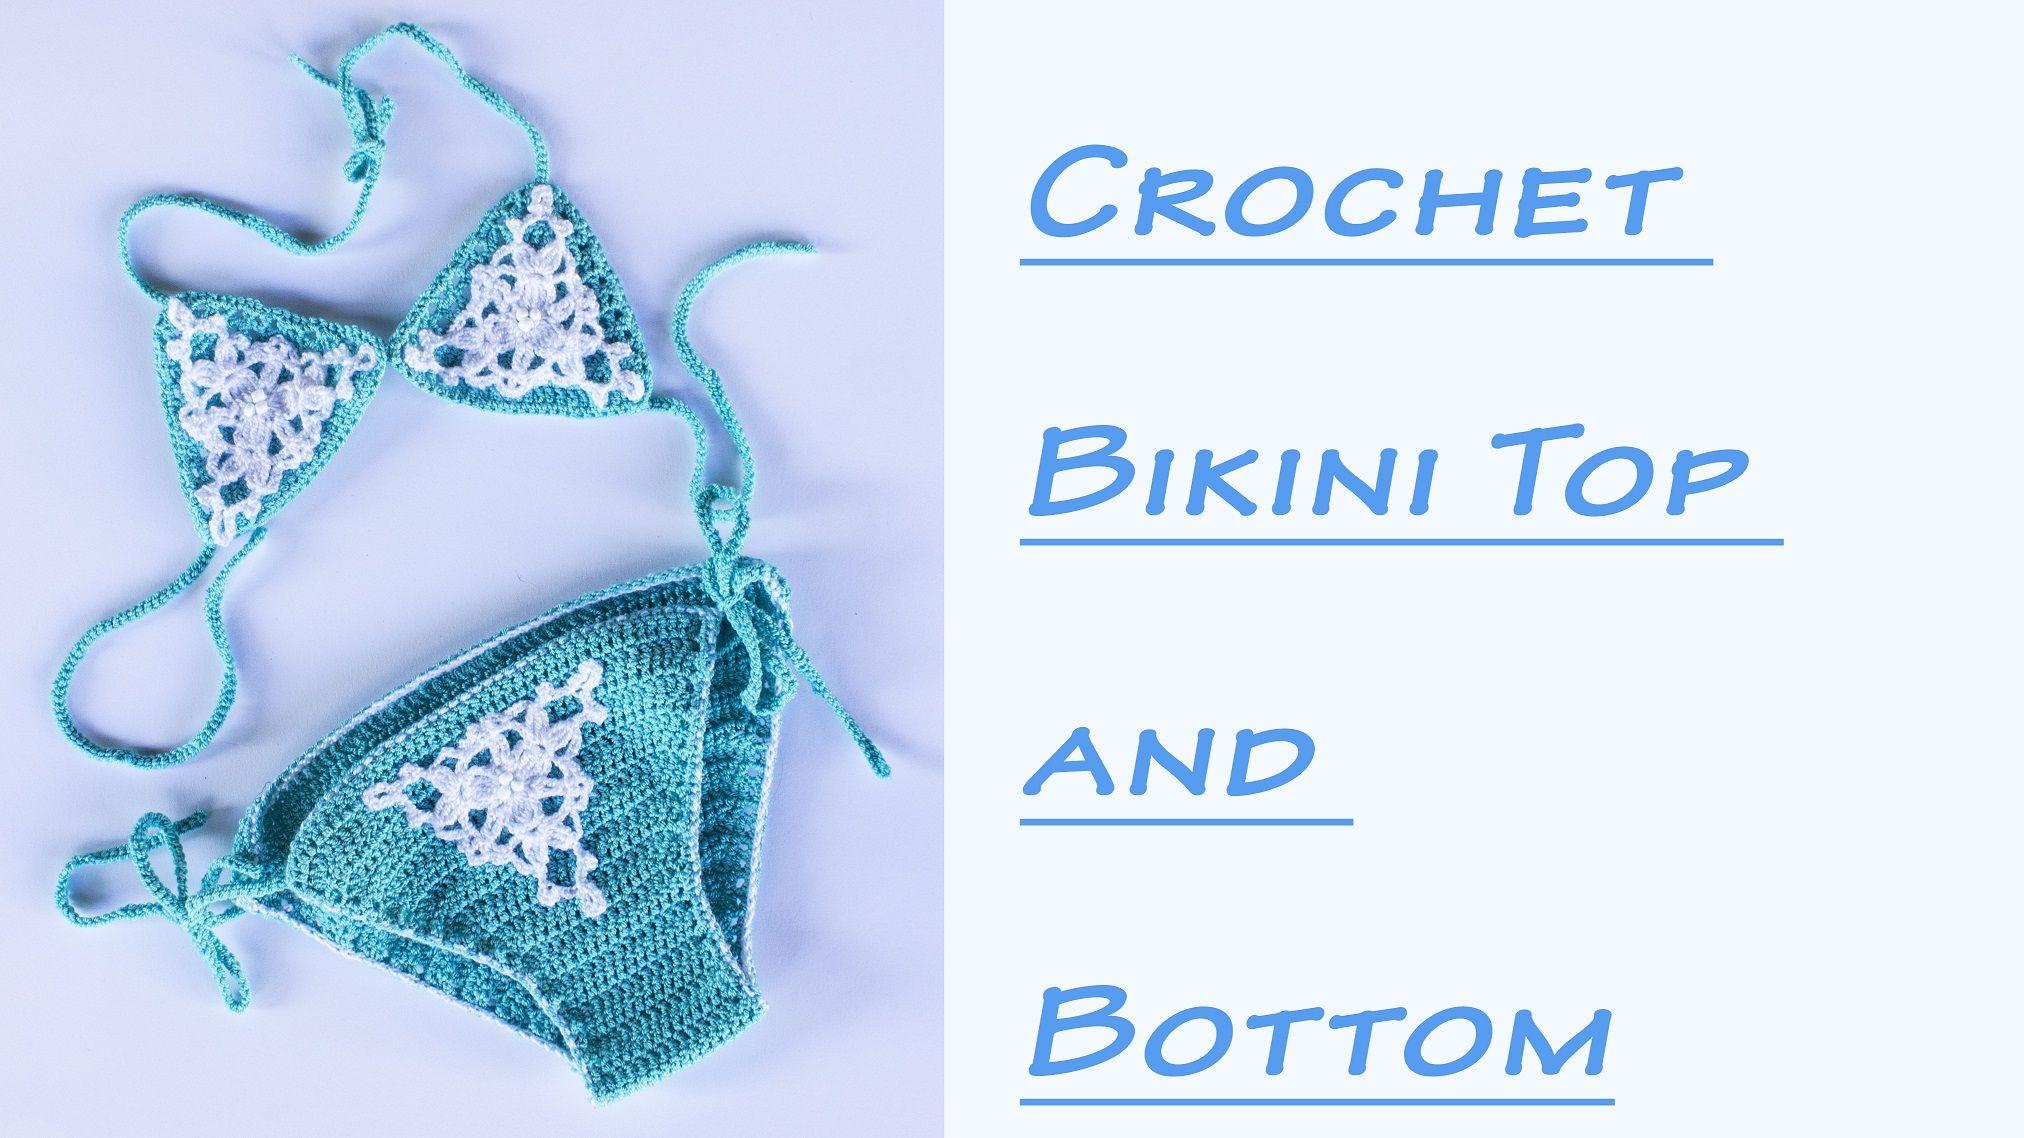 Crochet patterns free crochet patterns free baby crochet patterns crochet bikini top and bottom baby bikini wika crochet show your crafts and diy projects dt1010fo